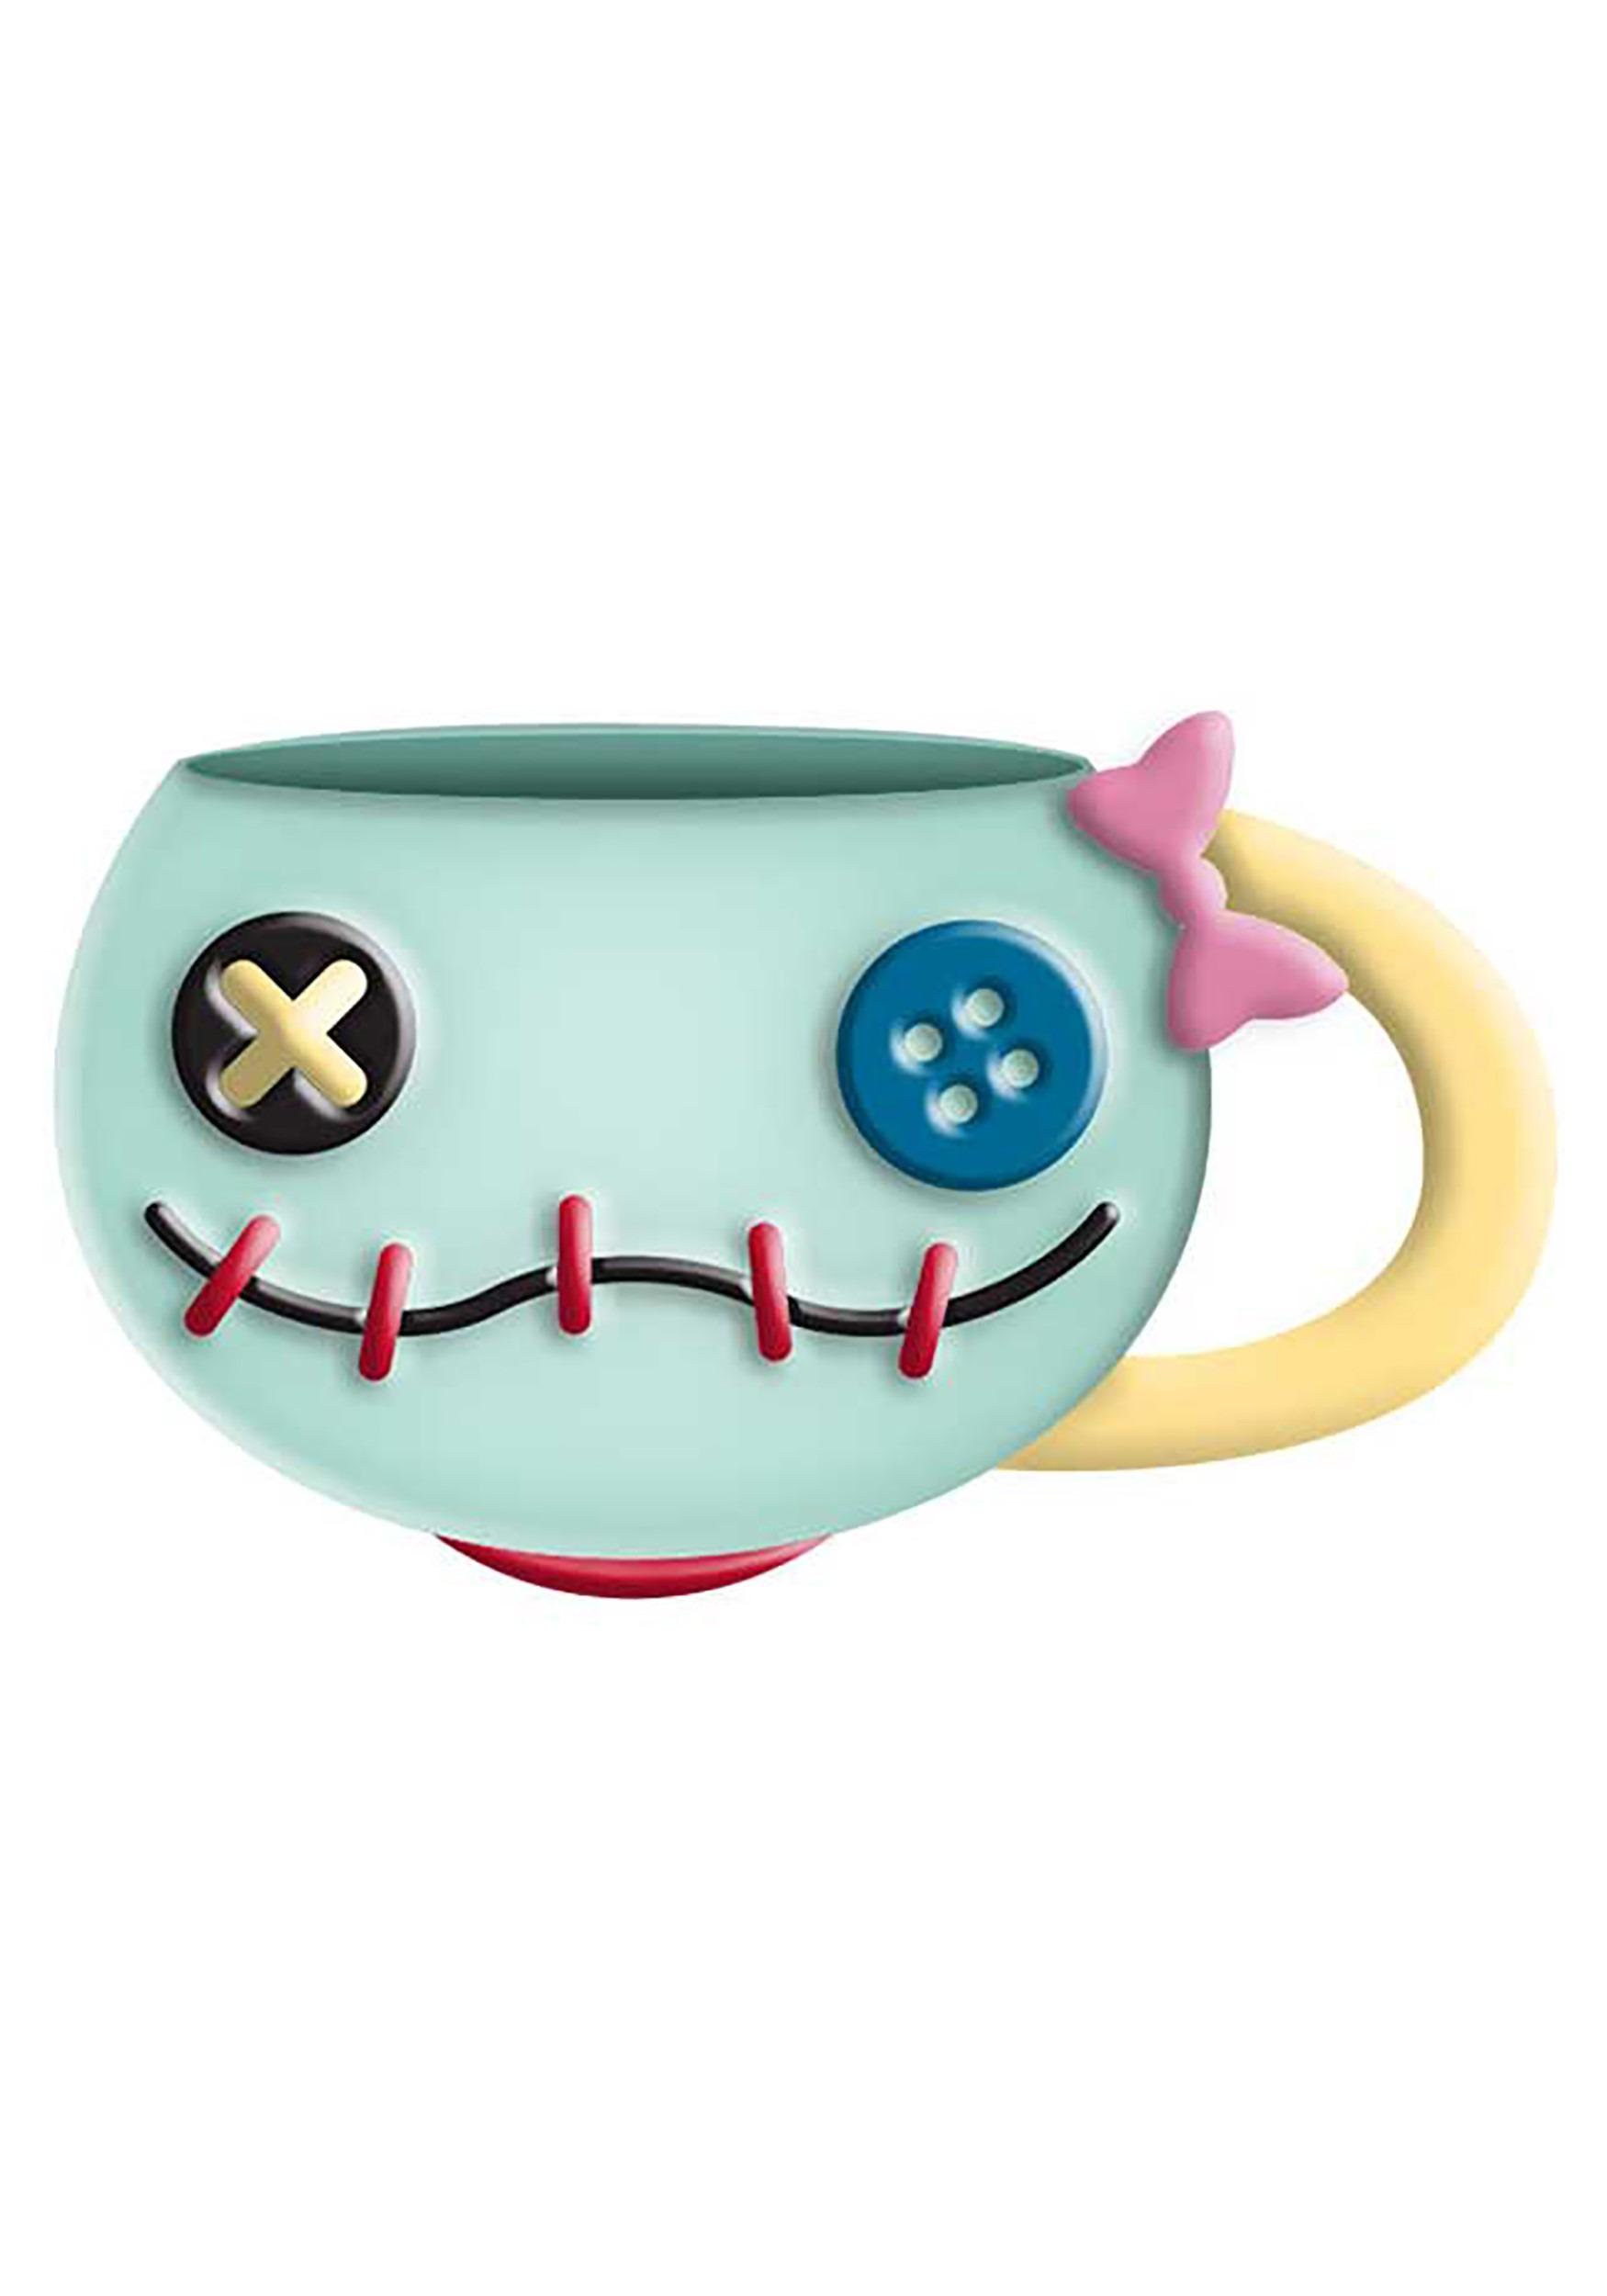 Scrump Lilo & Stitch 3D Mug